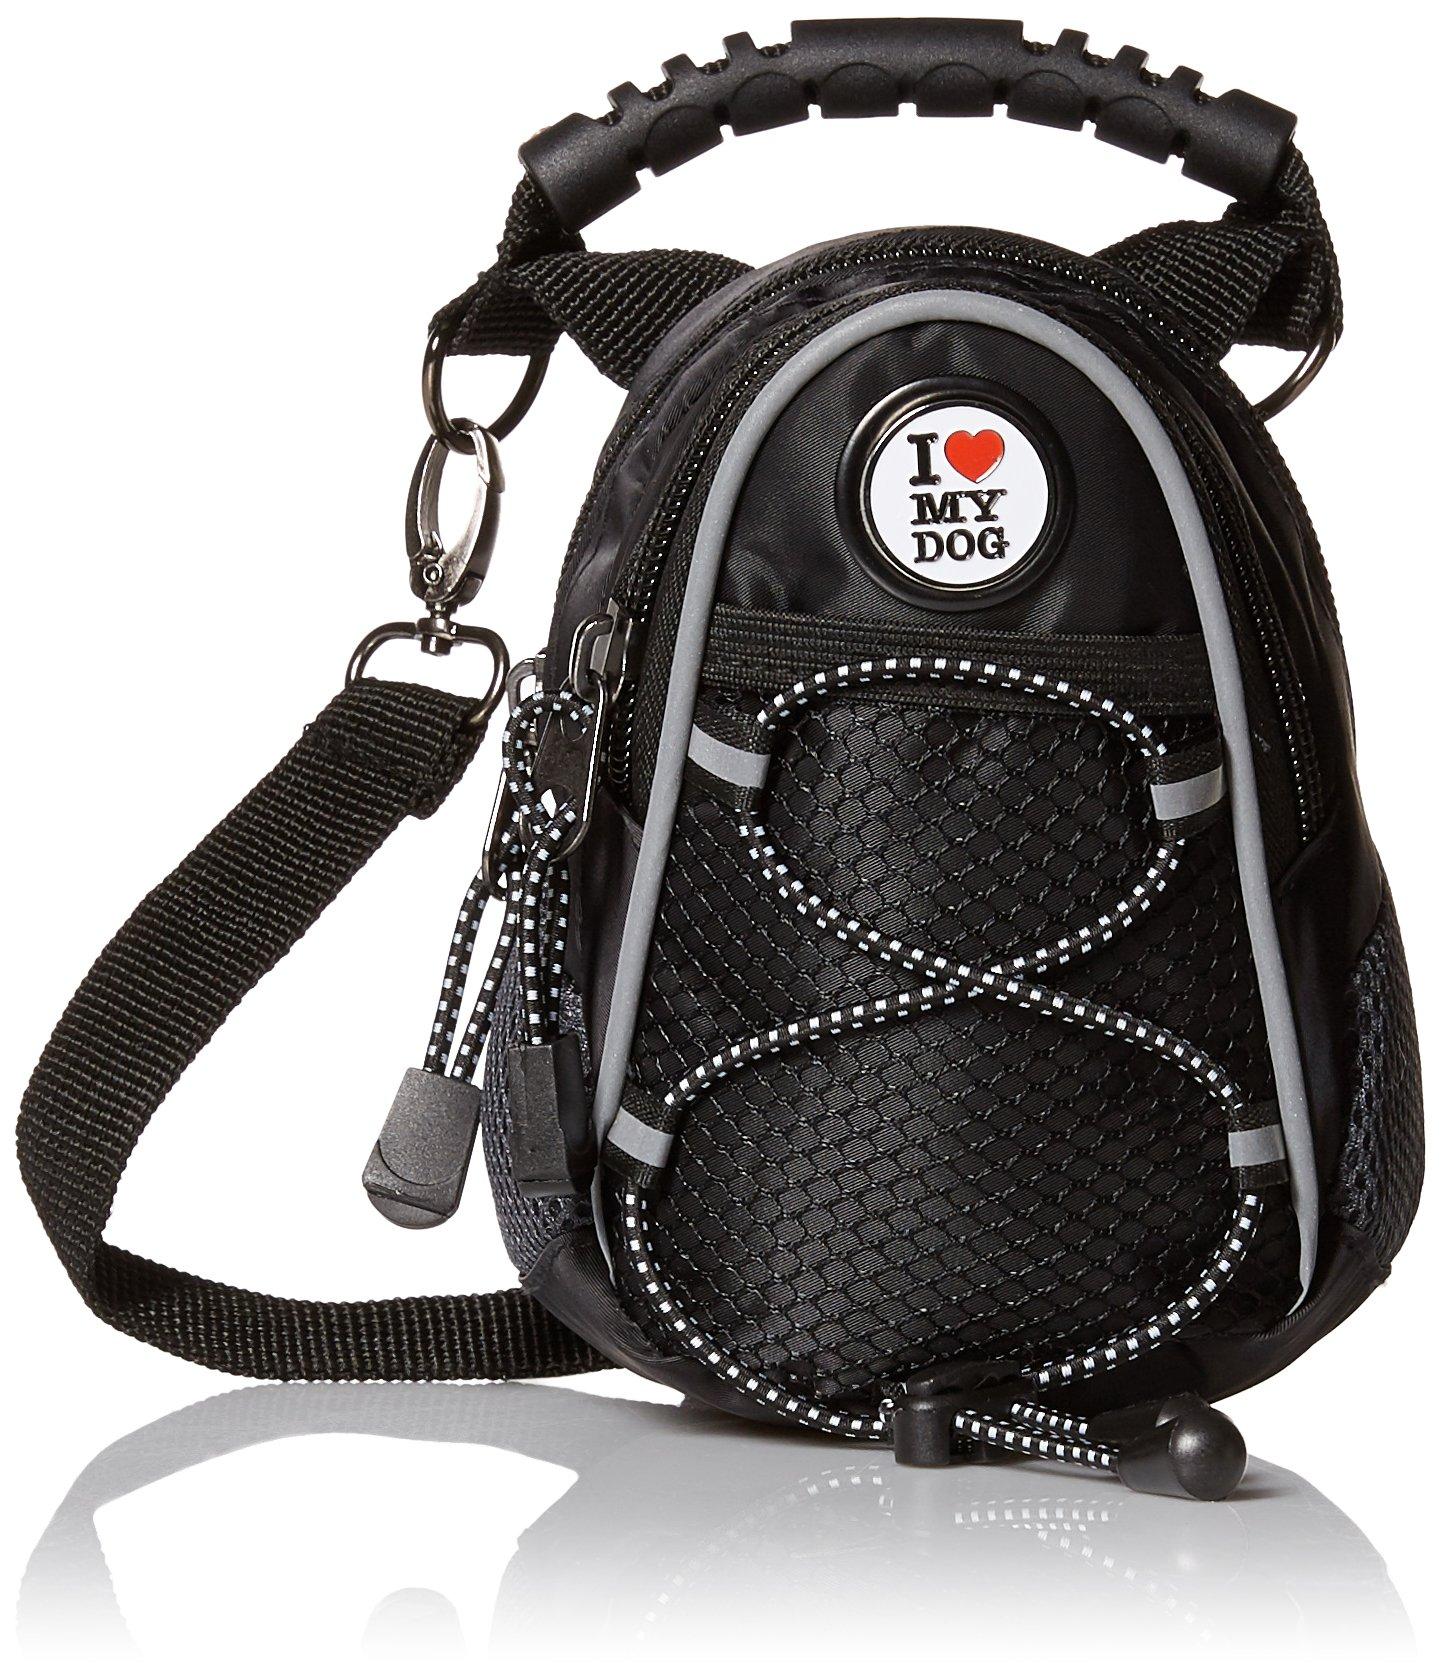 CMC Golf I Love My Dog Mini Daypack, Black